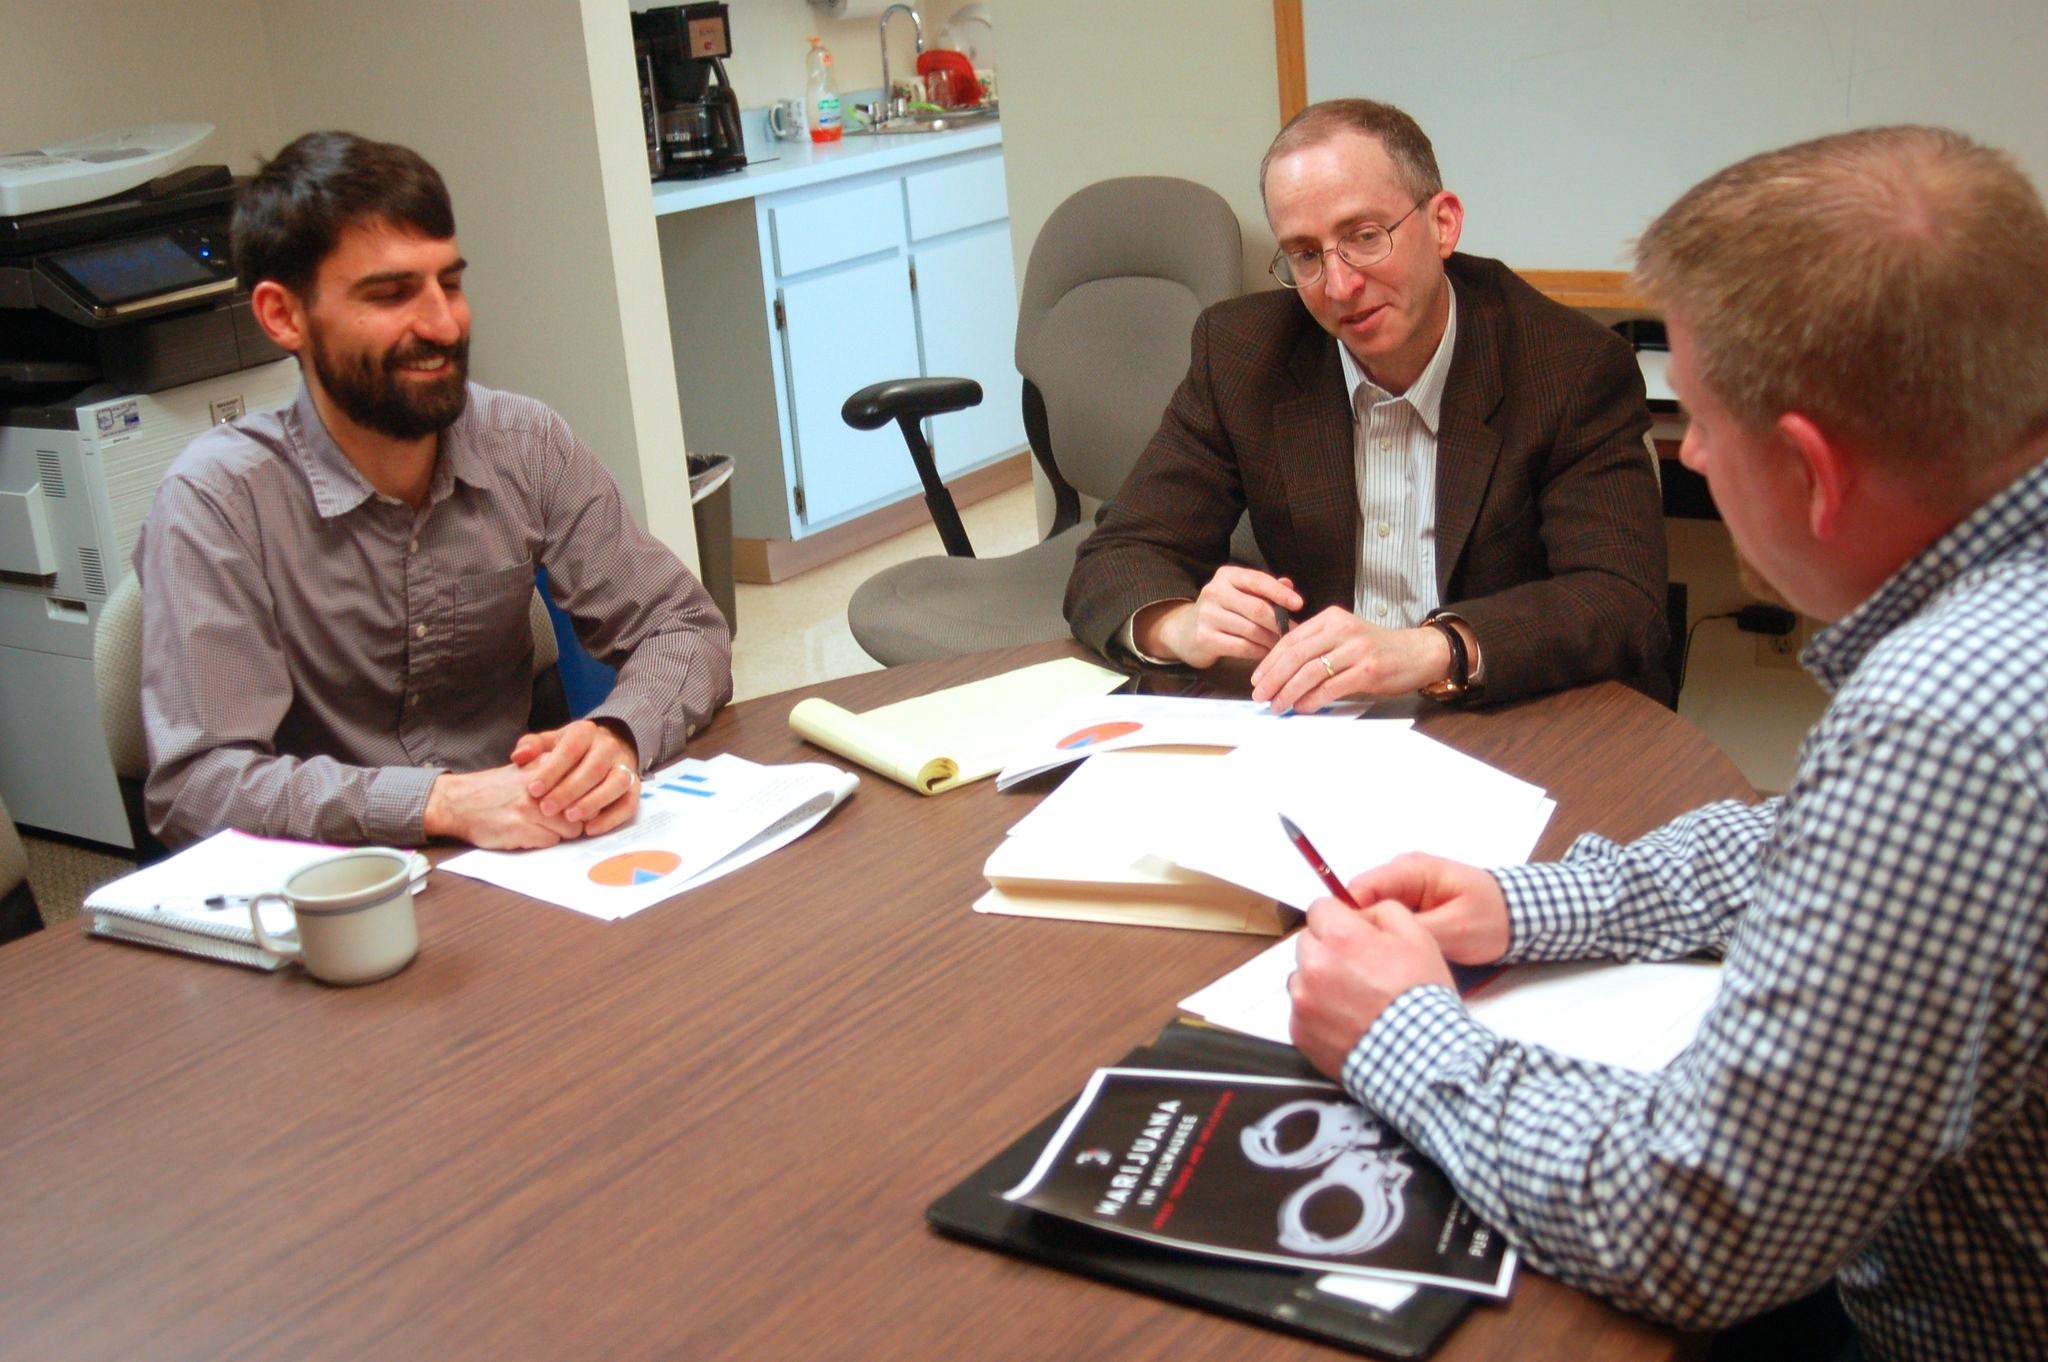 Rob Henken, Public Policy Forum president (center) and researchers Joe Peterangelo (left) and Jeff Schmidt discuss the report. (Photo by Edgar Mendez)